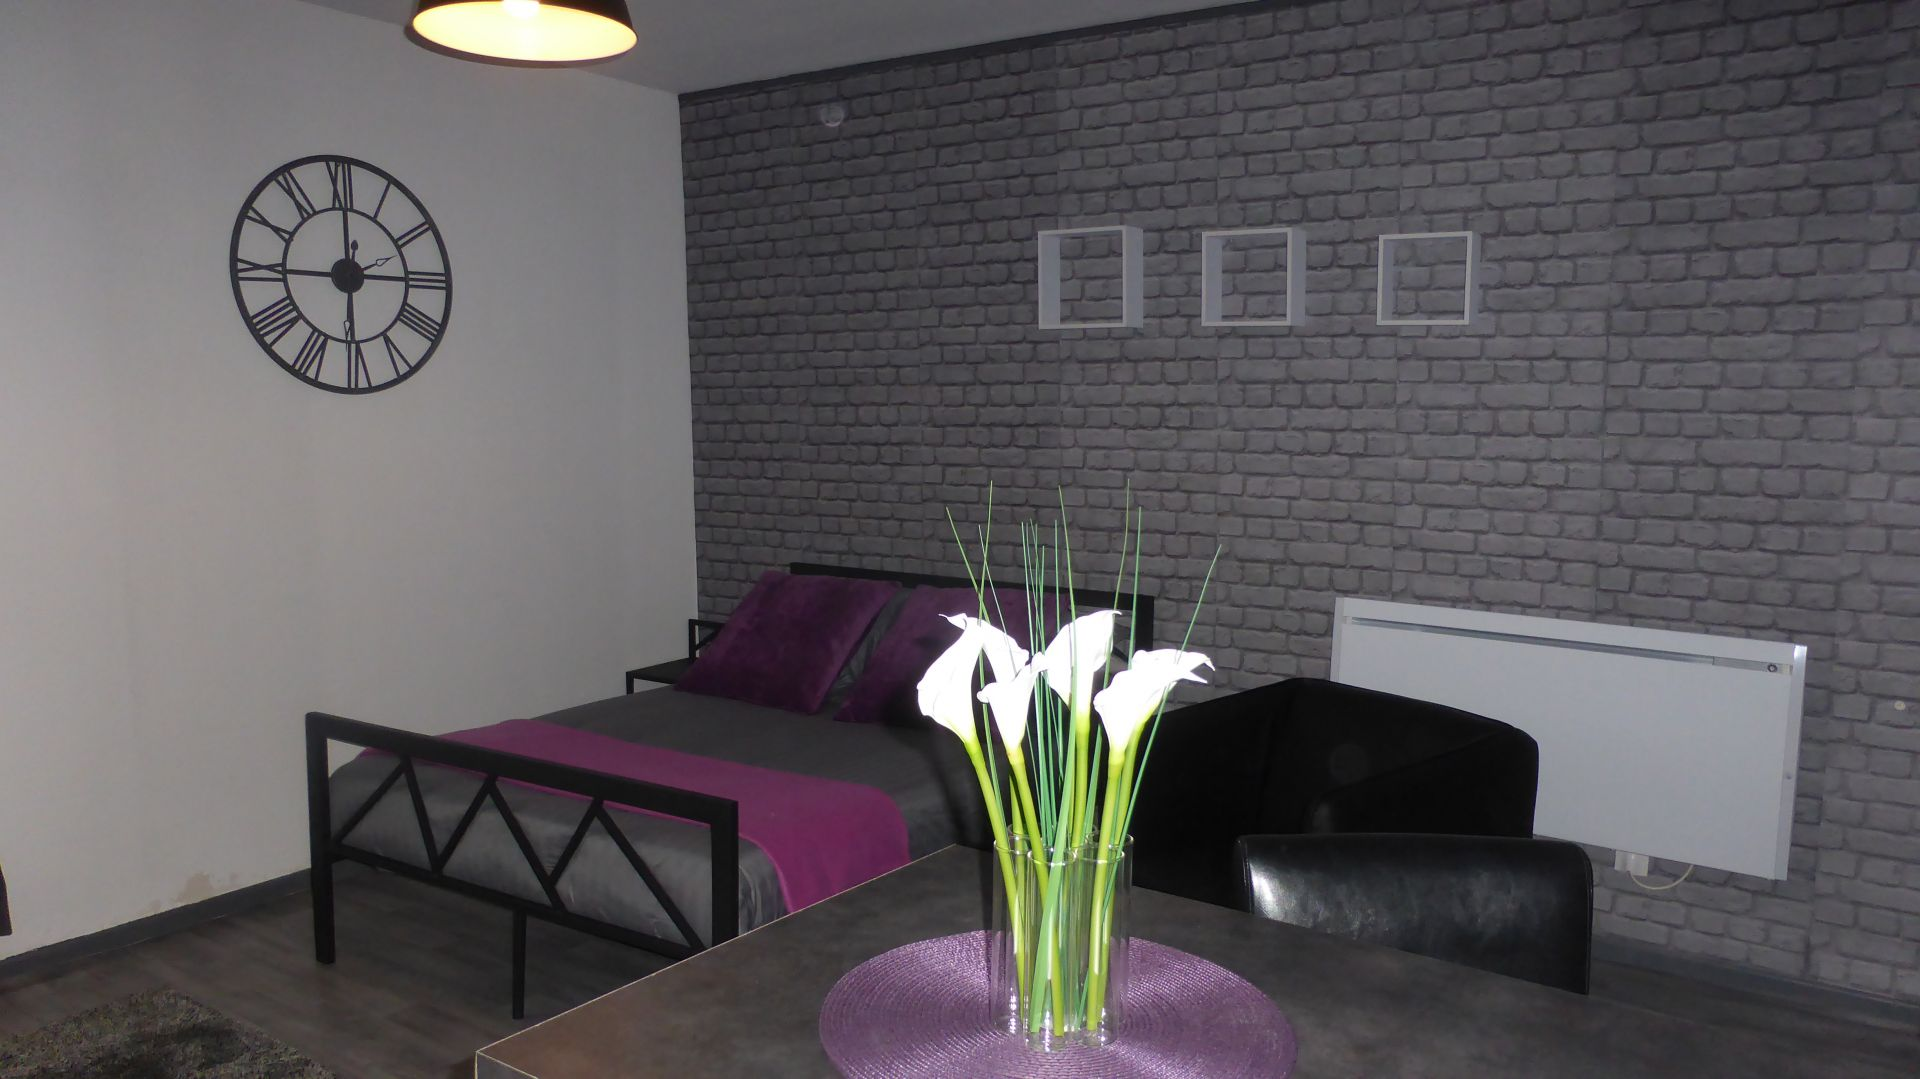 studio meubl vieille porte lorraine tourisme. Black Bedroom Furniture Sets. Home Design Ideas